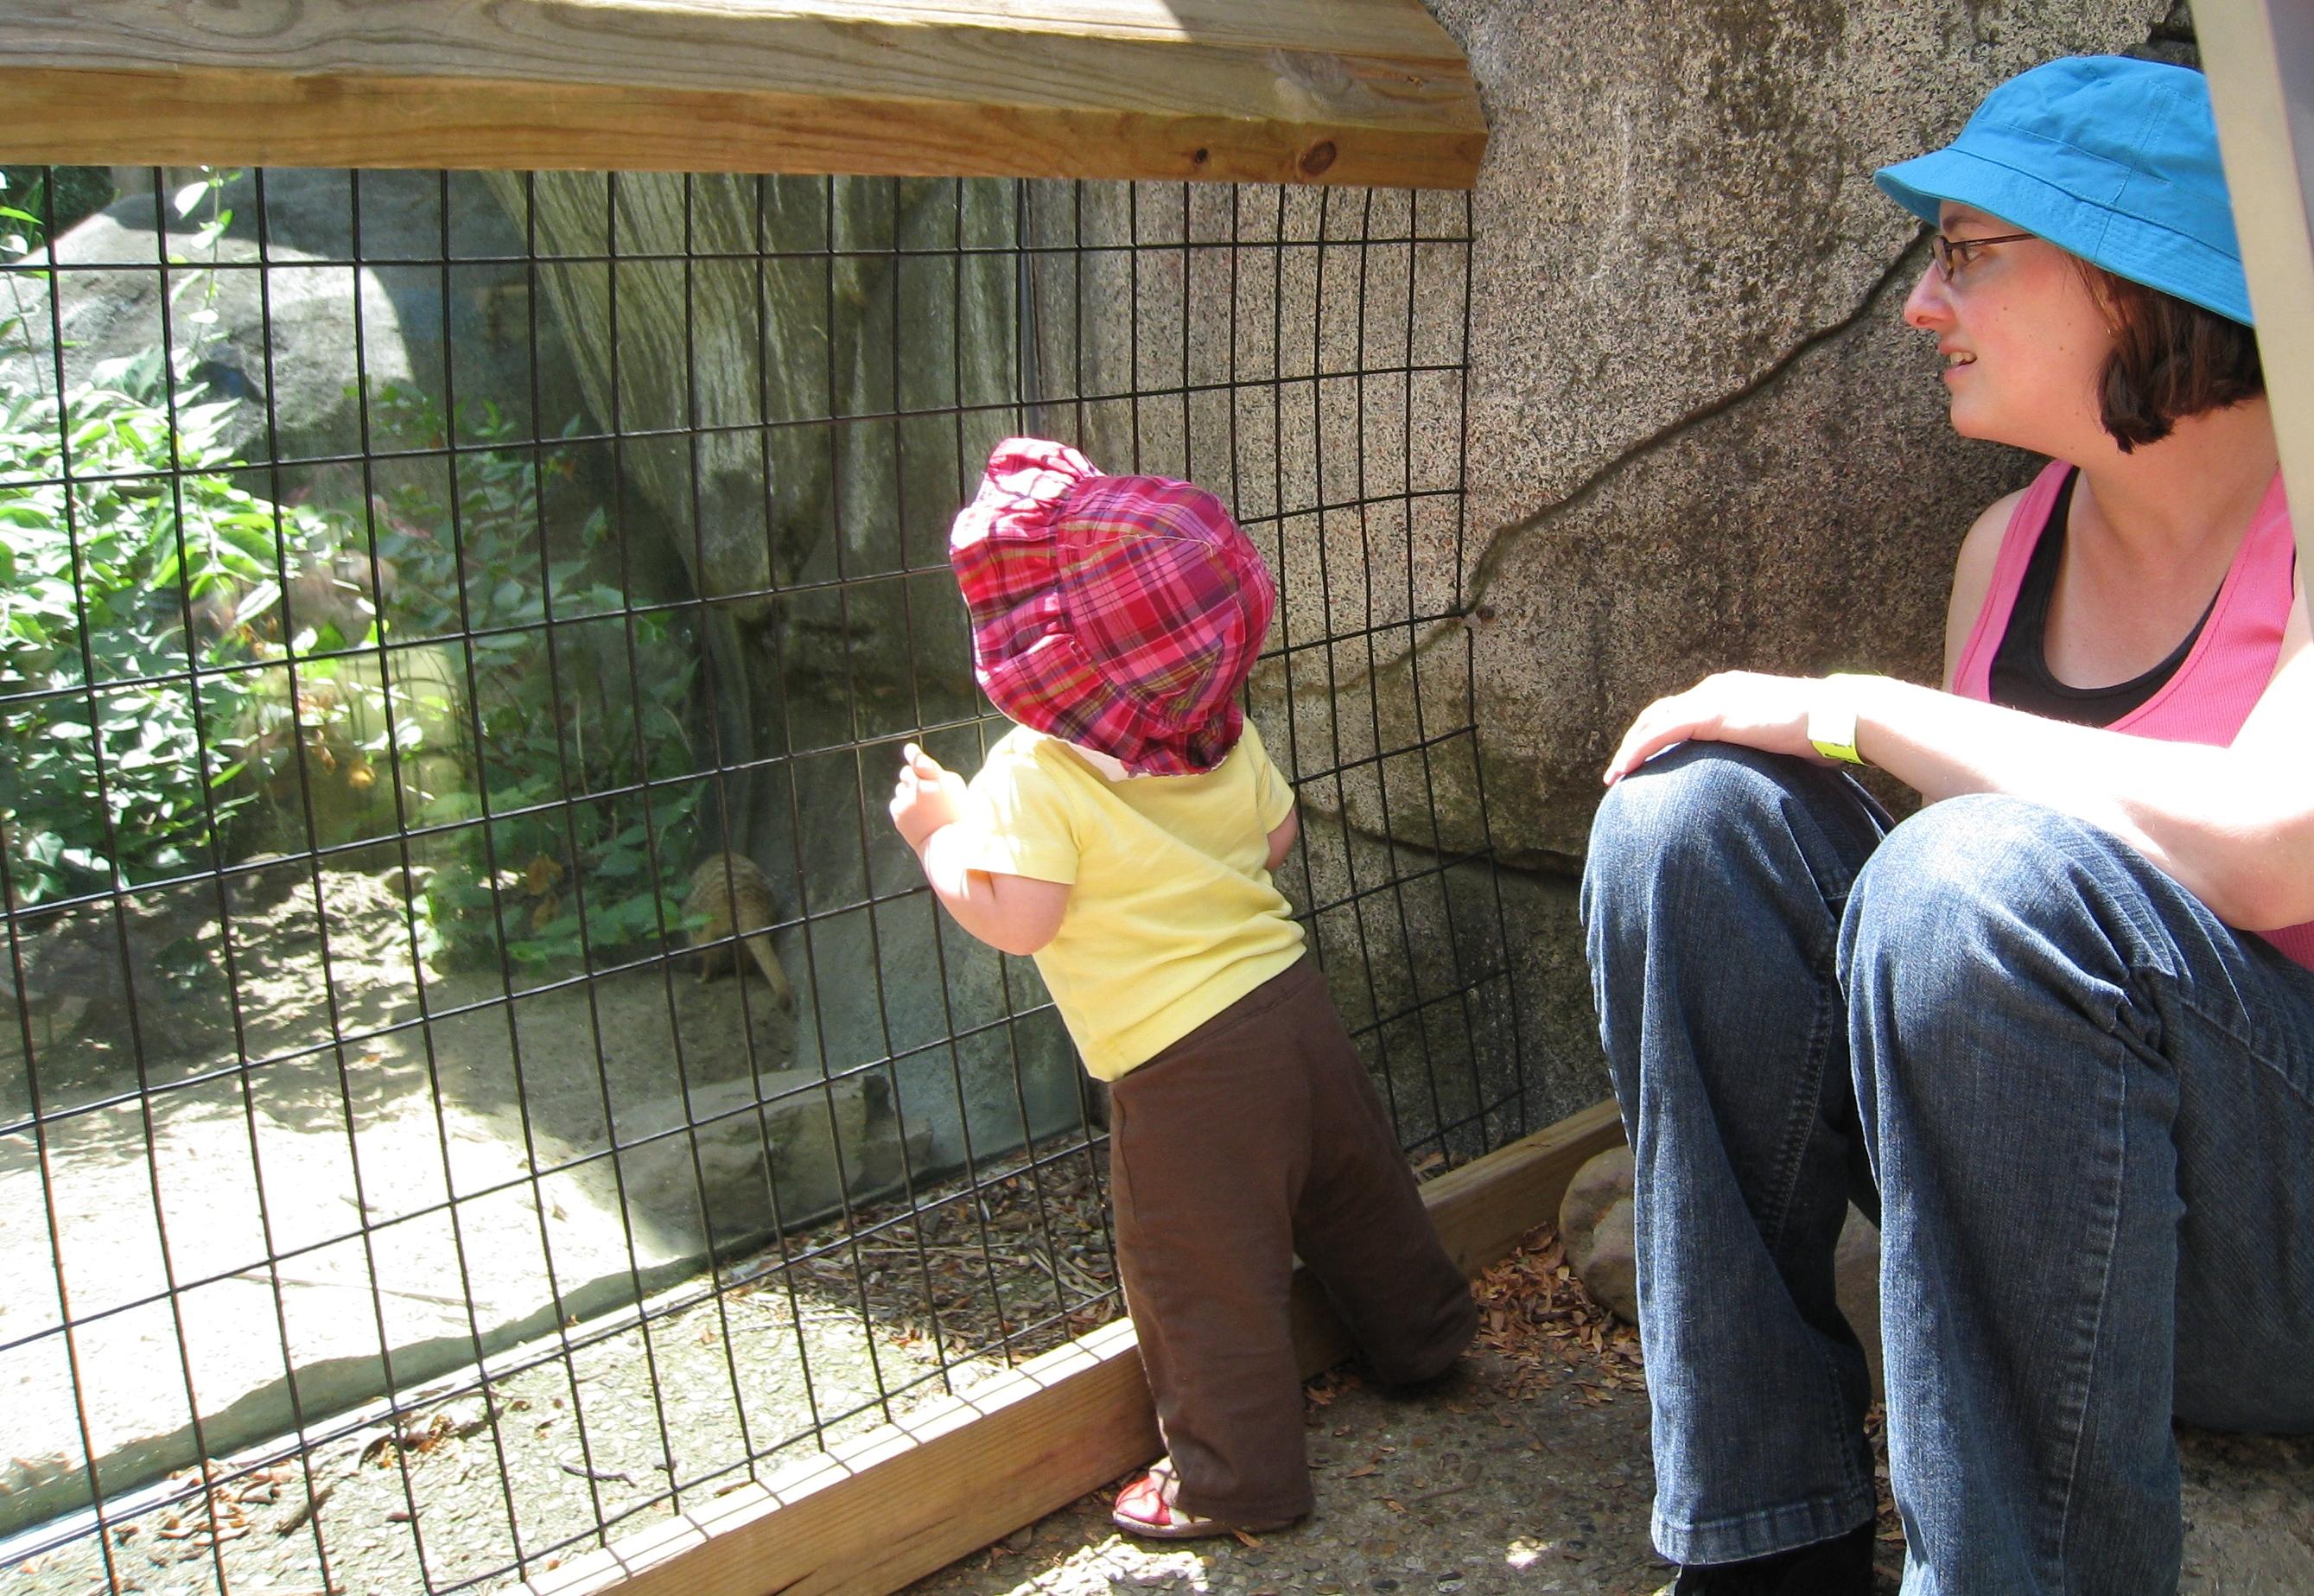 meekats and kivrin